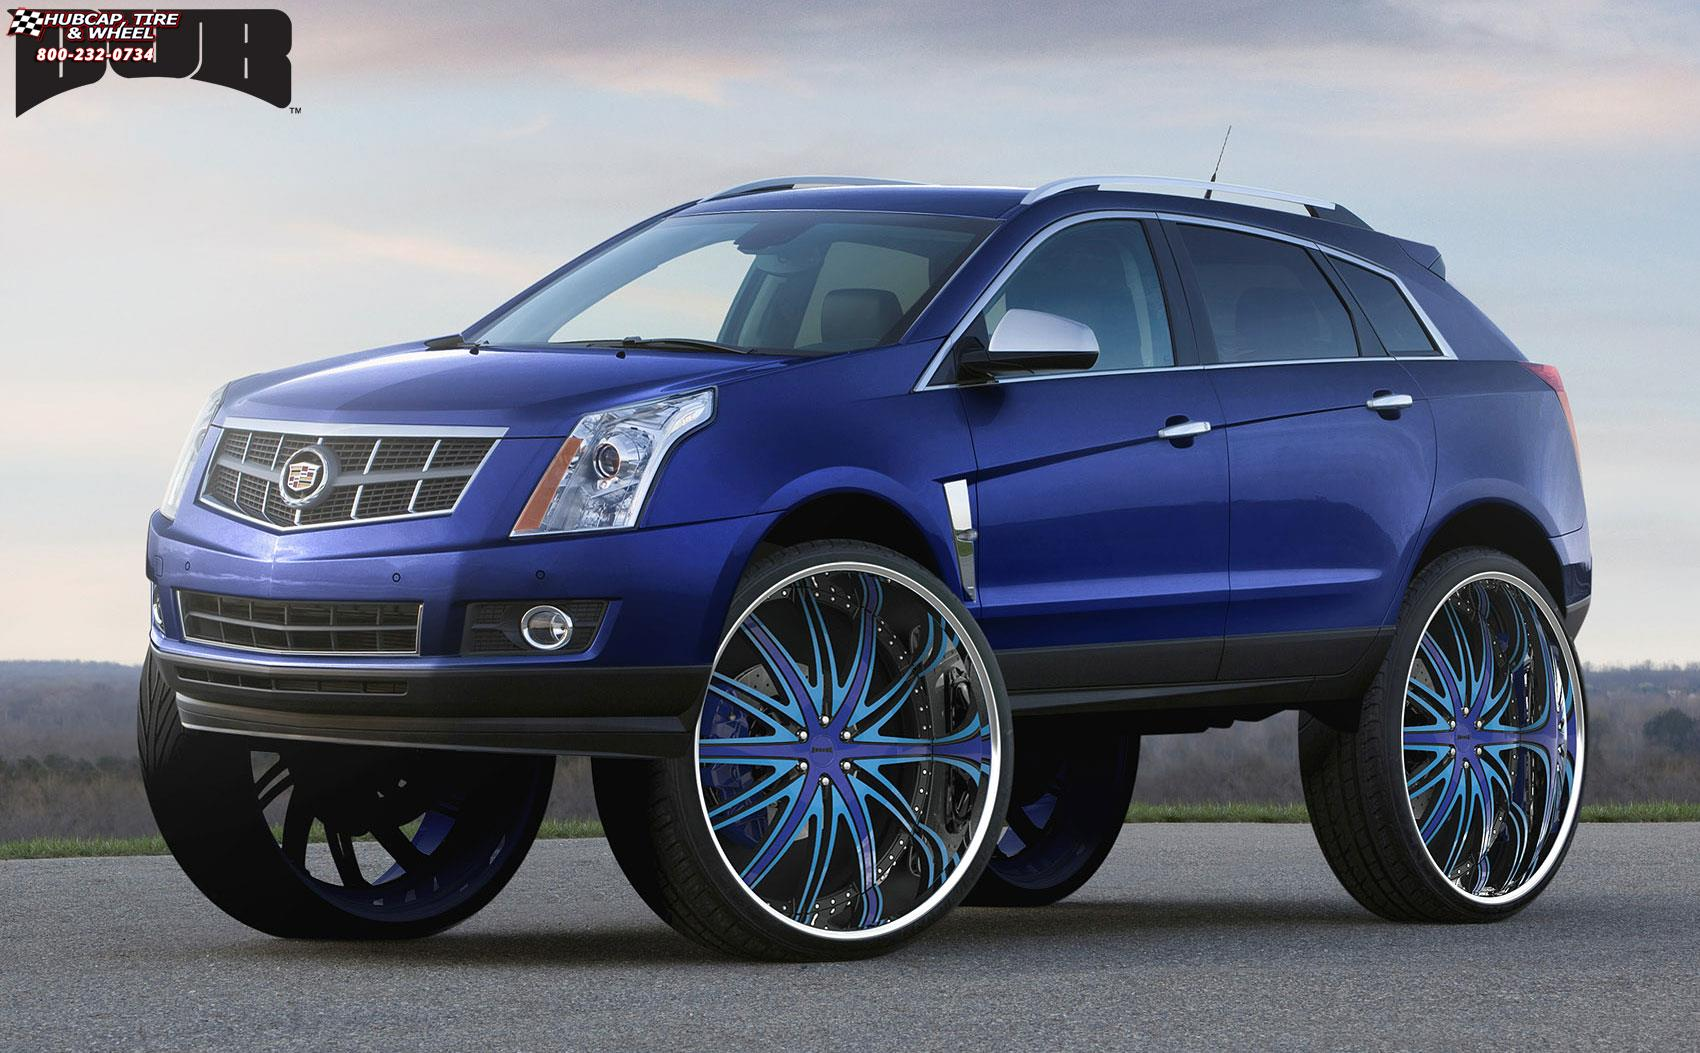 cadillac srx dub c22 flex wheels blue w black accents chrome lip. Black Bedroom Furniture Sets. Home Design Ideas